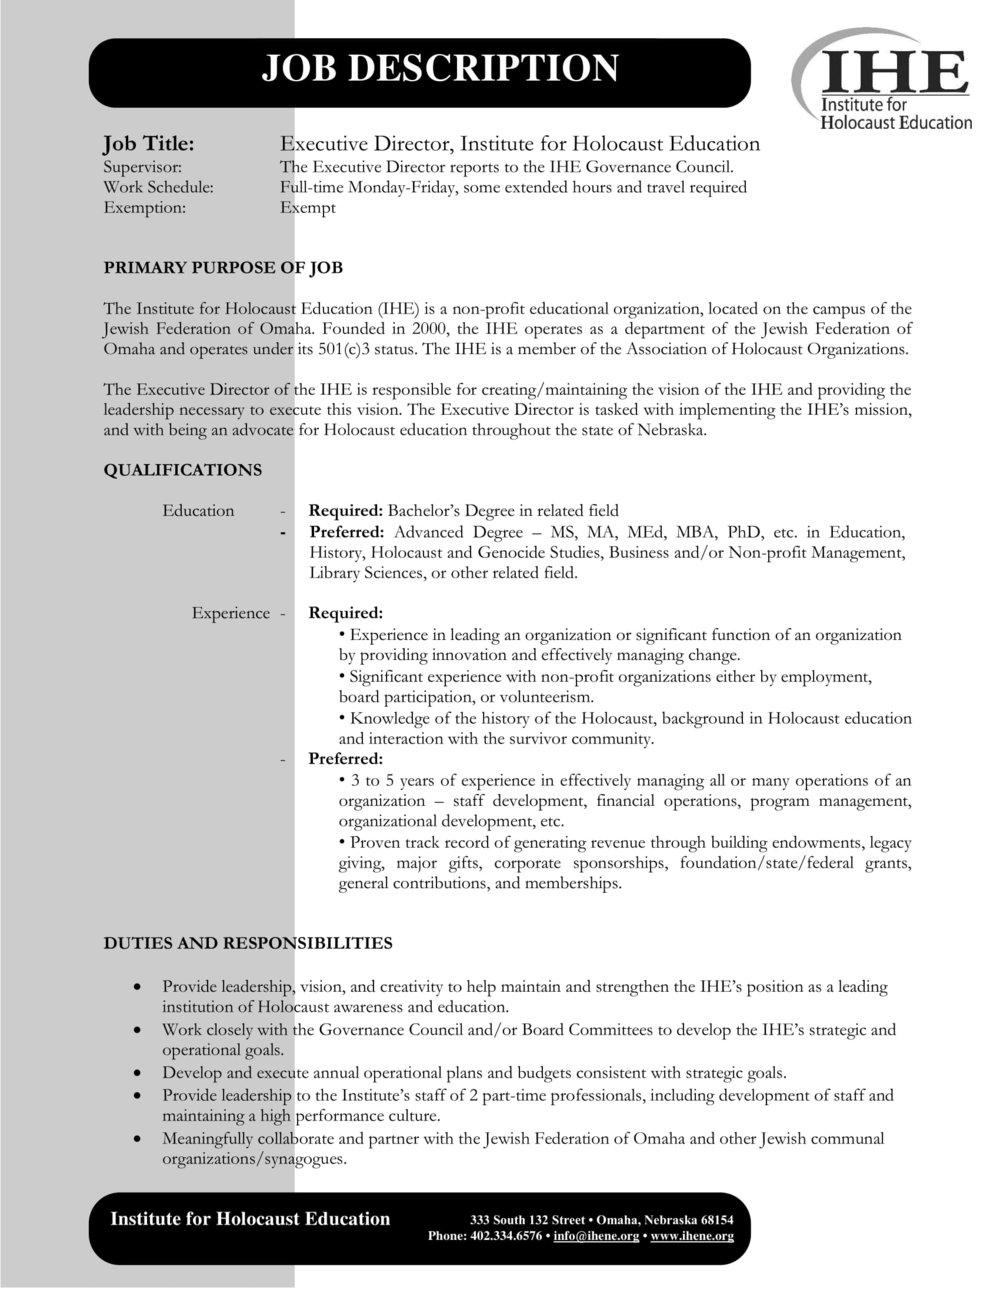 IHE Executive Director.job description-1.jpg